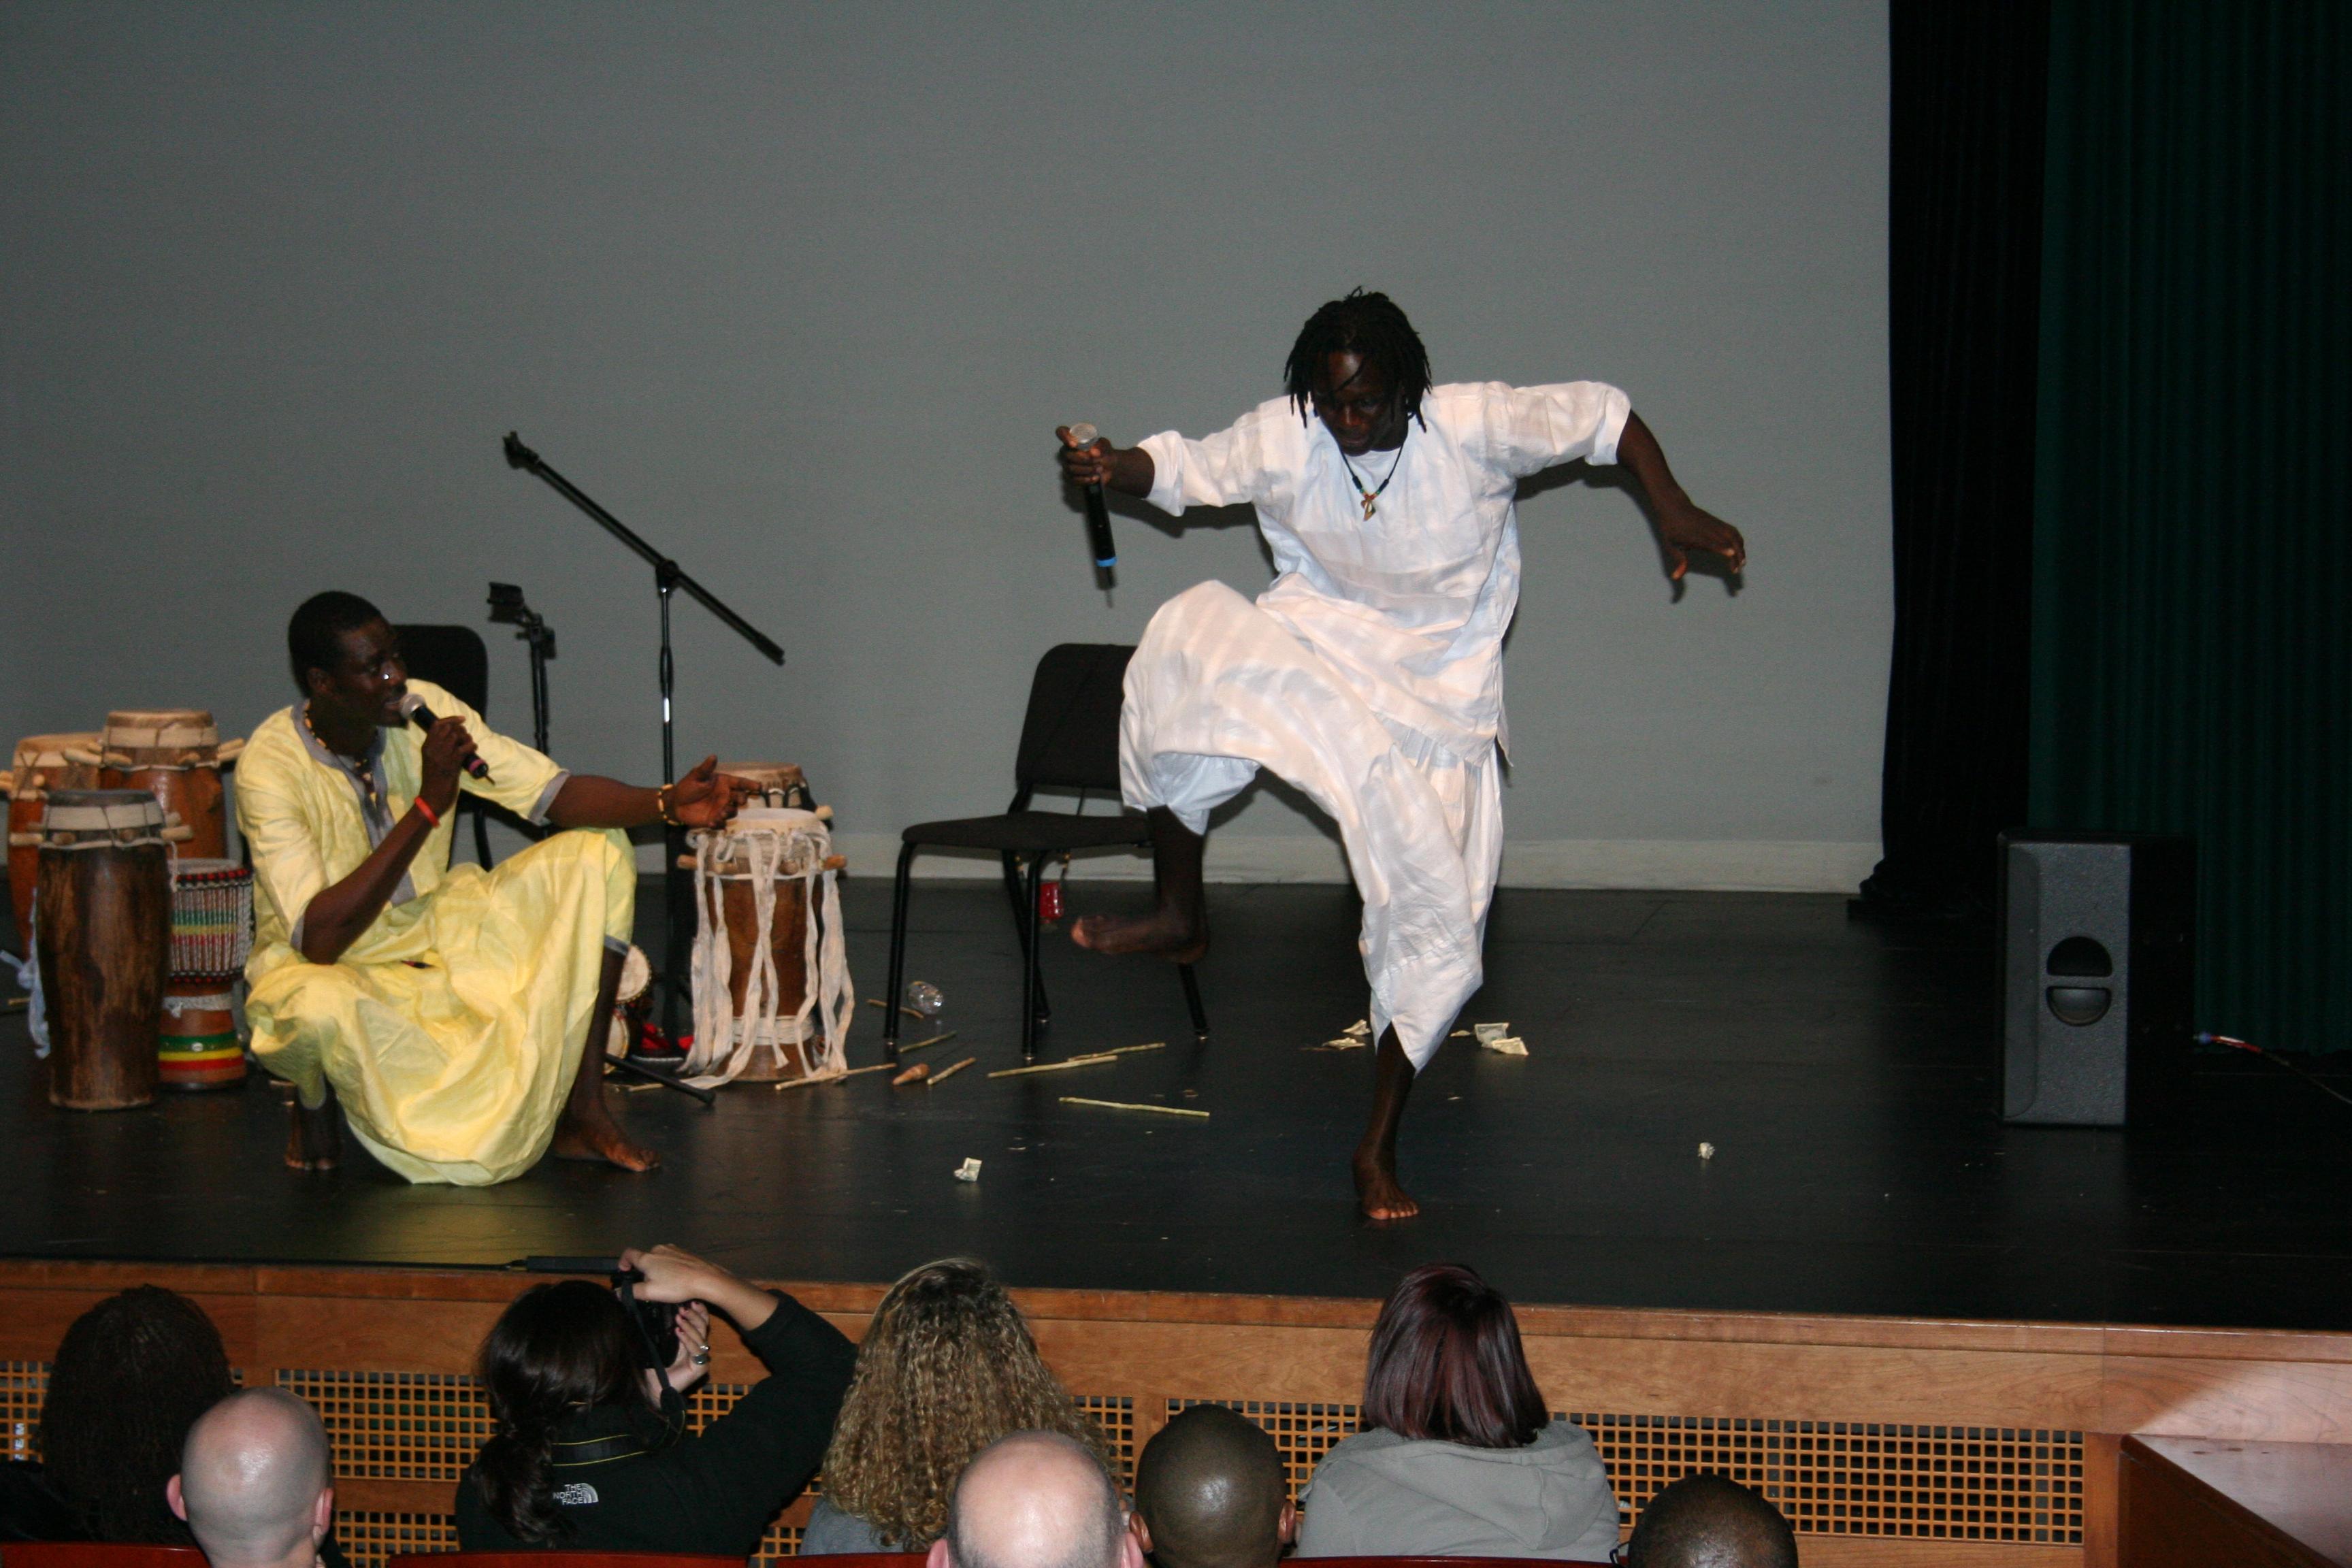 Malick dances as Moustapha raps Tassu.